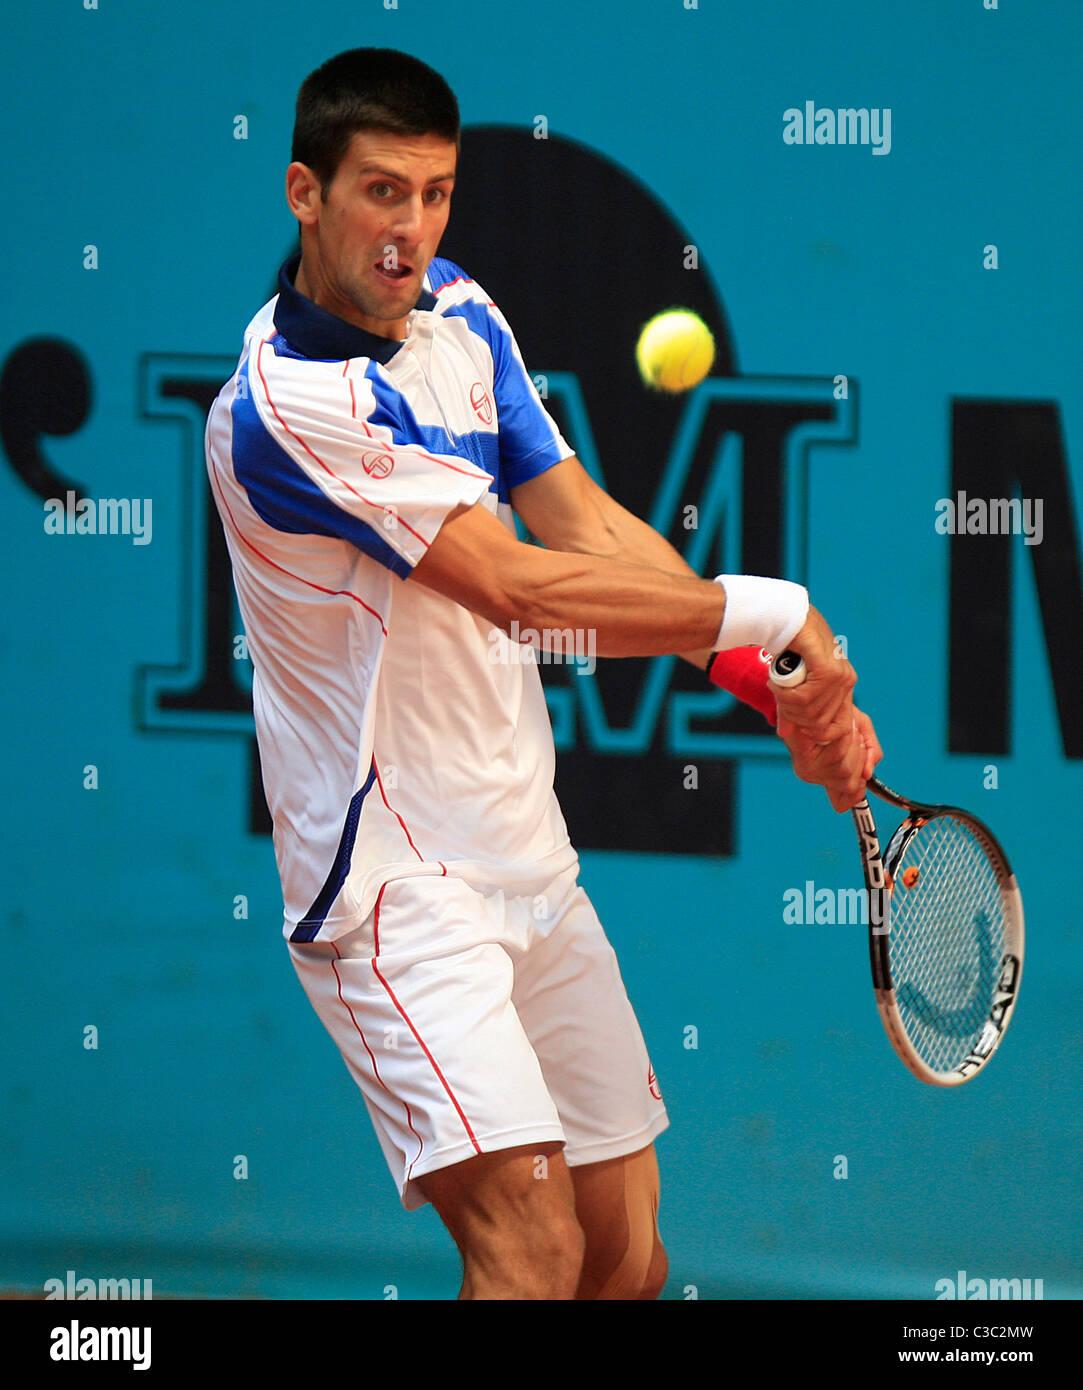 05.05.2011 - Novak Djokovic (SRB) in action against Guillermo García-López (ESP), 3rd Round of the Mutua - Stock Image